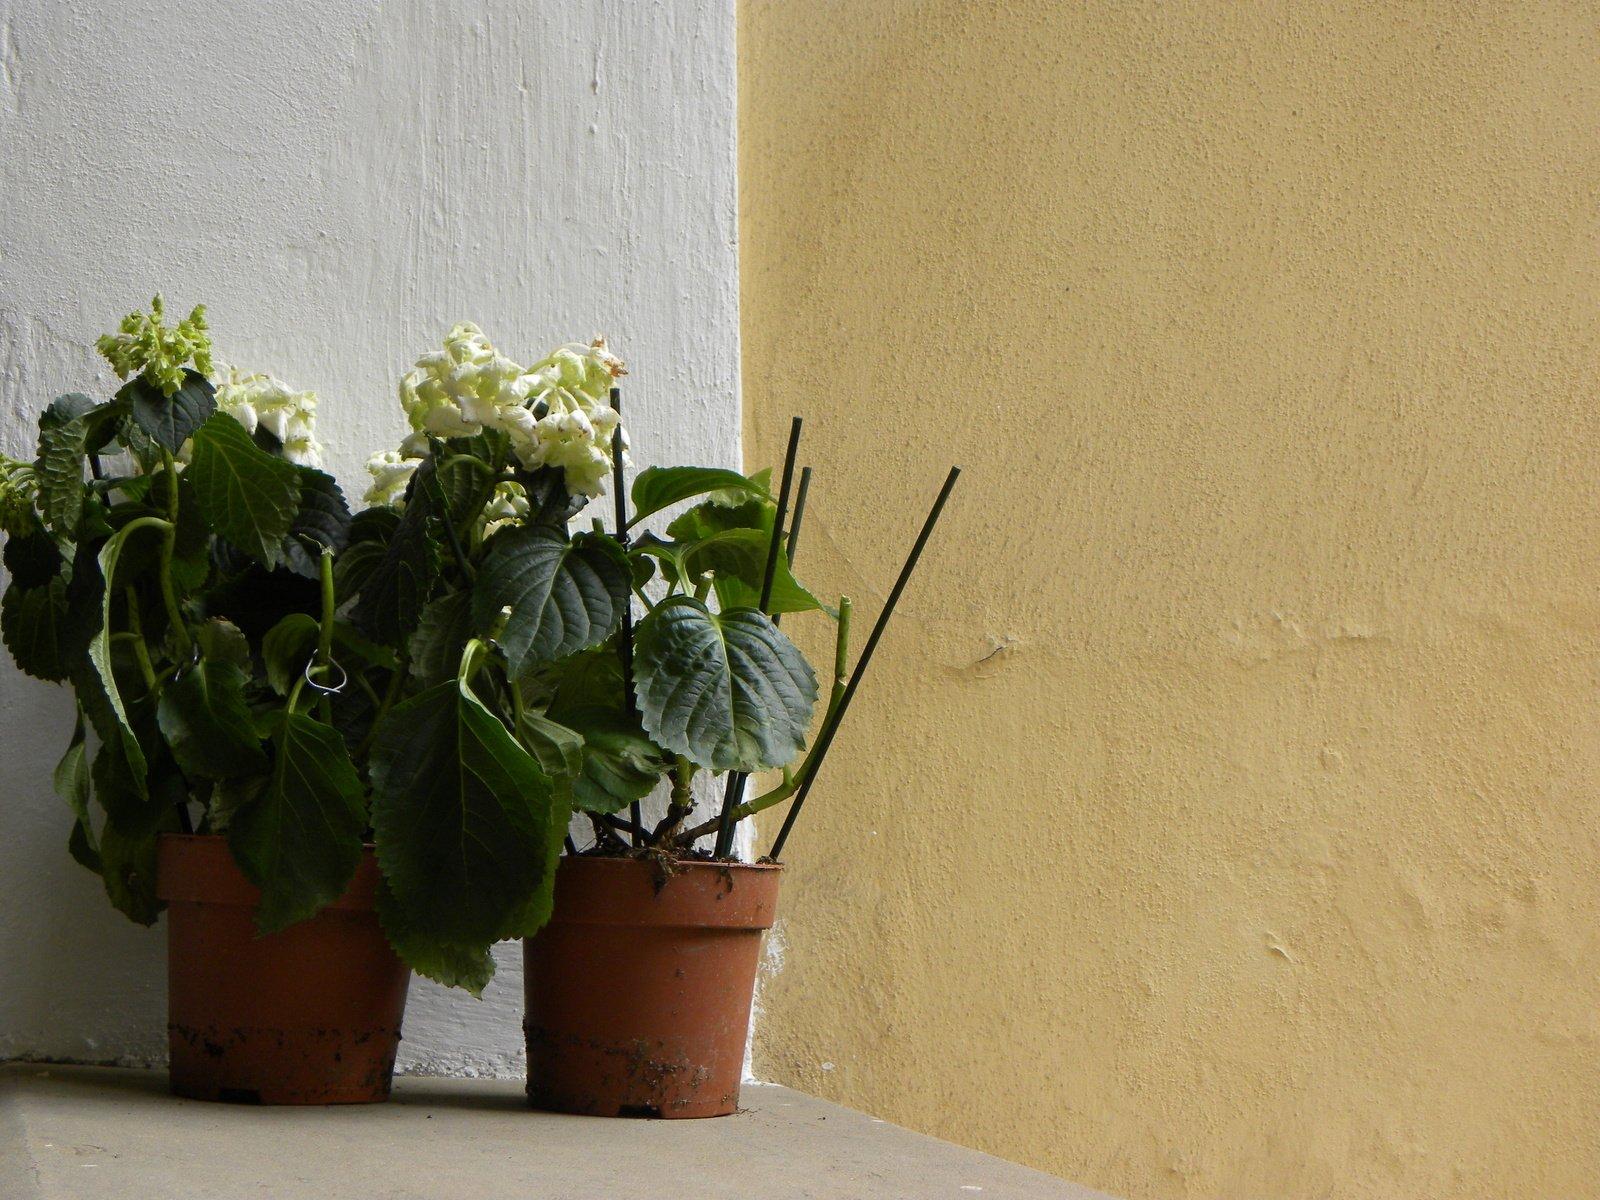 Free two flowerpots with yellow flowers on white yellow background free two flowerpots with yellow flowers on white yellow background stock photo mightylinksfo